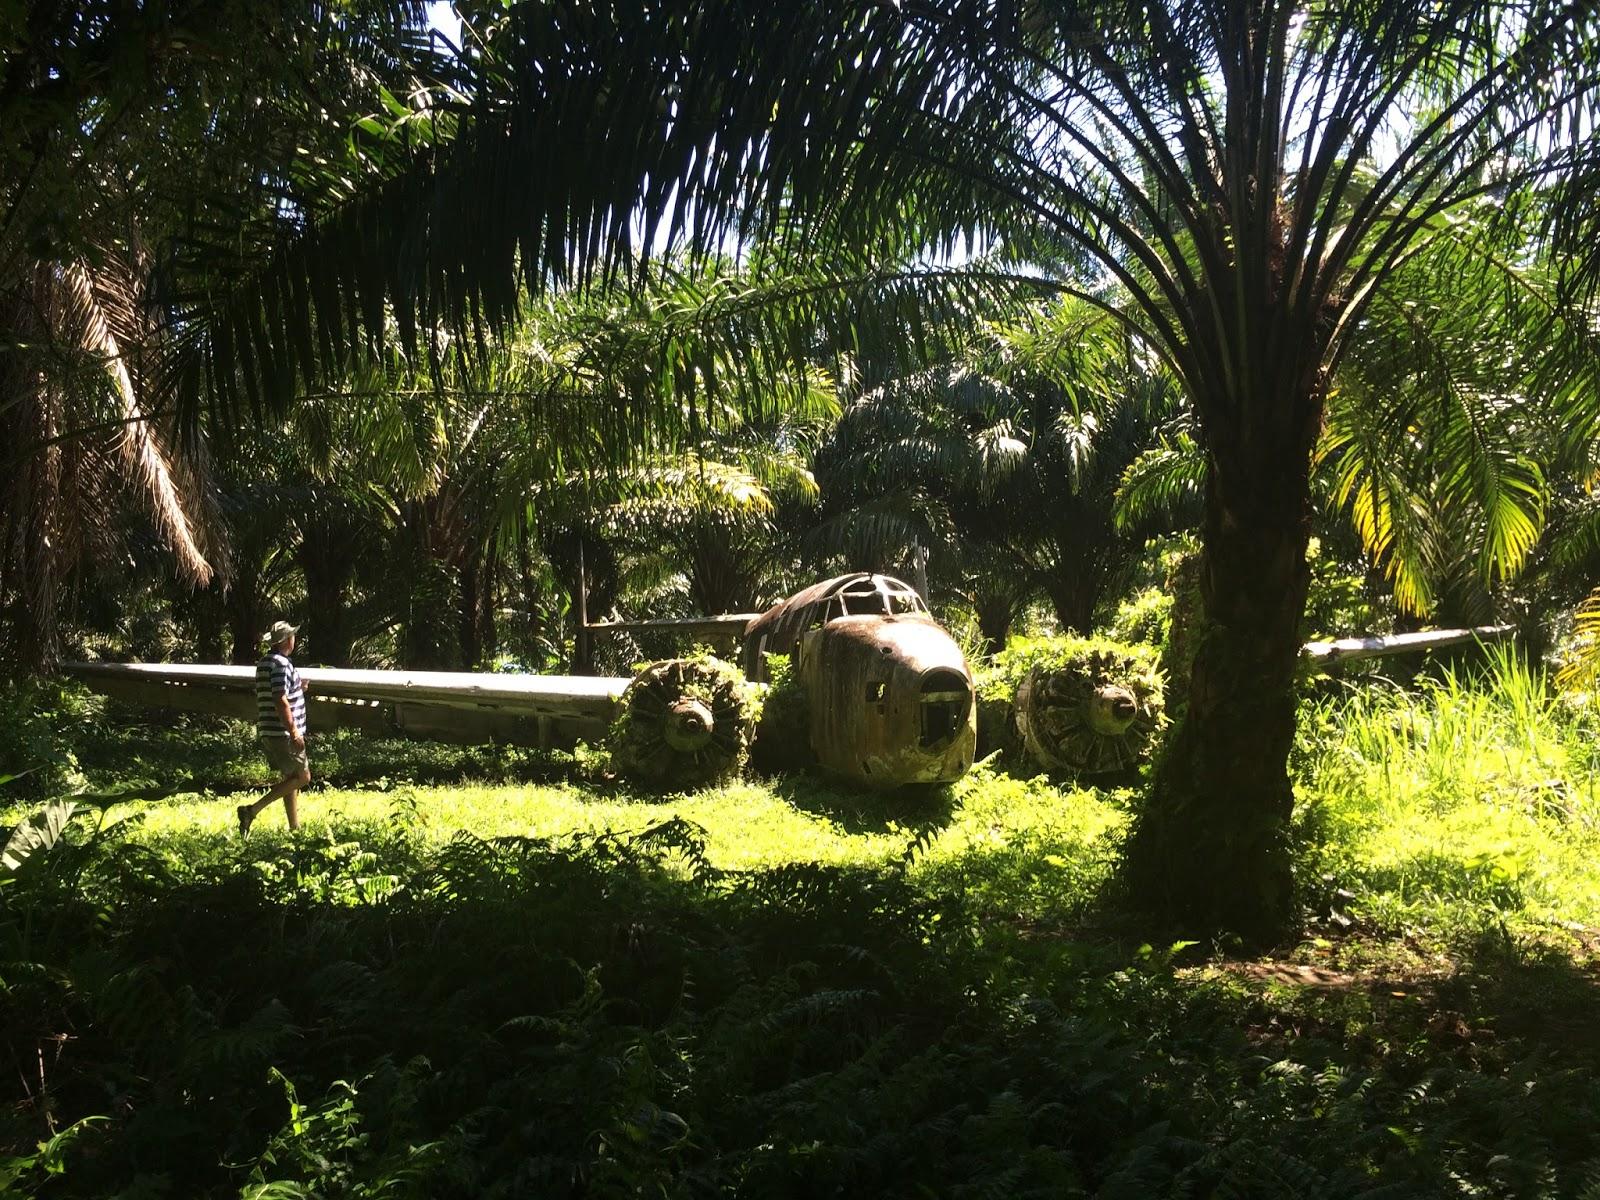 Uncovering World War II Plane Relics, Papua New Guinea - Adventure